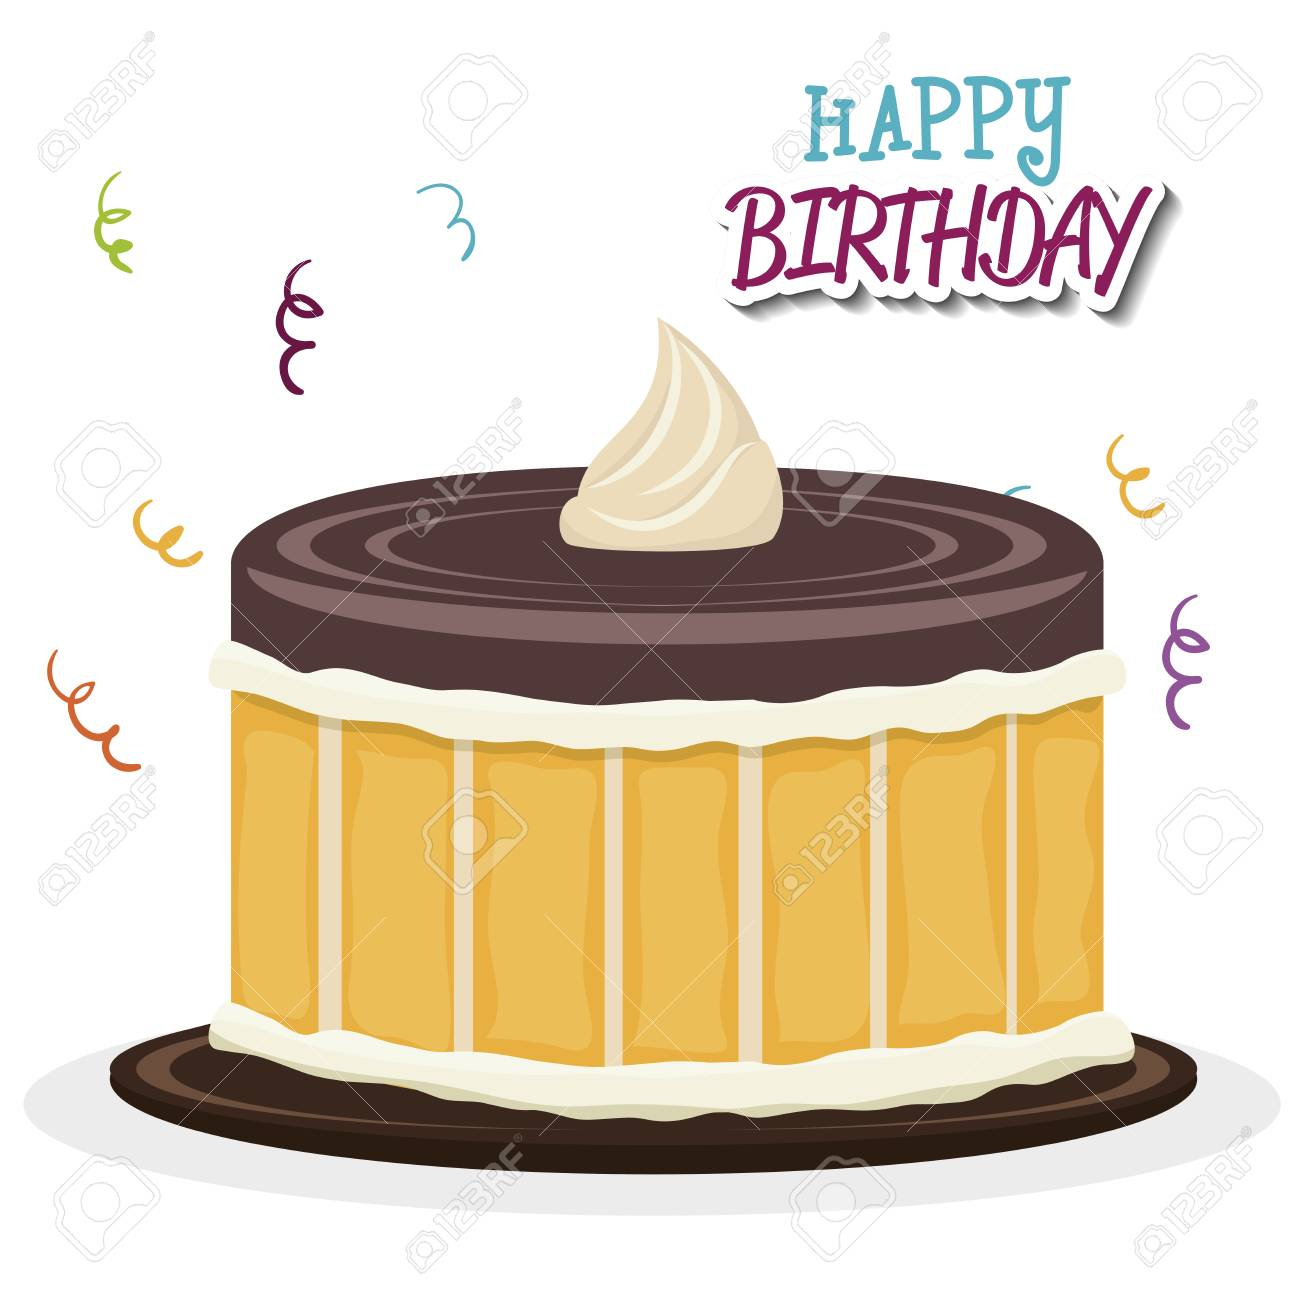 Happy Birthday Cake Isolated Icon Design Vector Illustration Graphic Stock